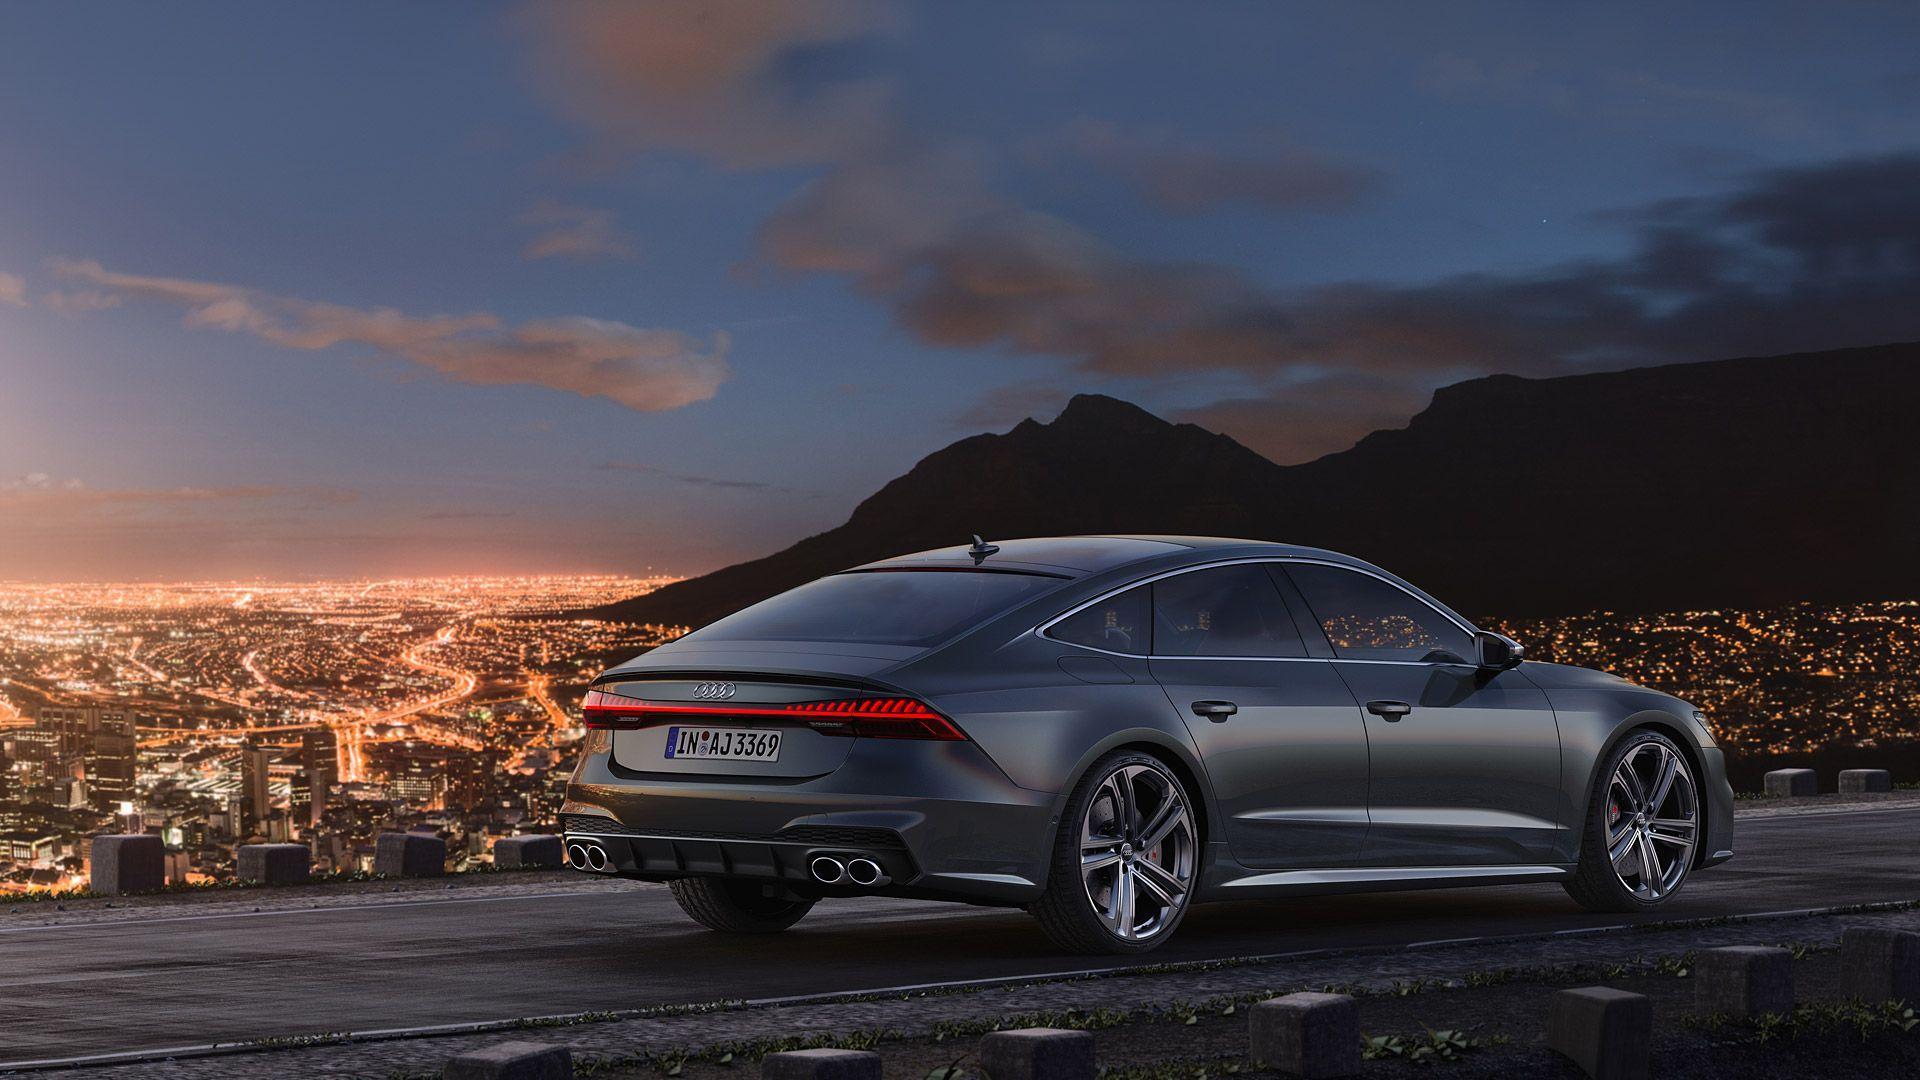 Audi 2020 Wallpapers Top Free Audi 2020 Backgrounds Wallpaperaccess